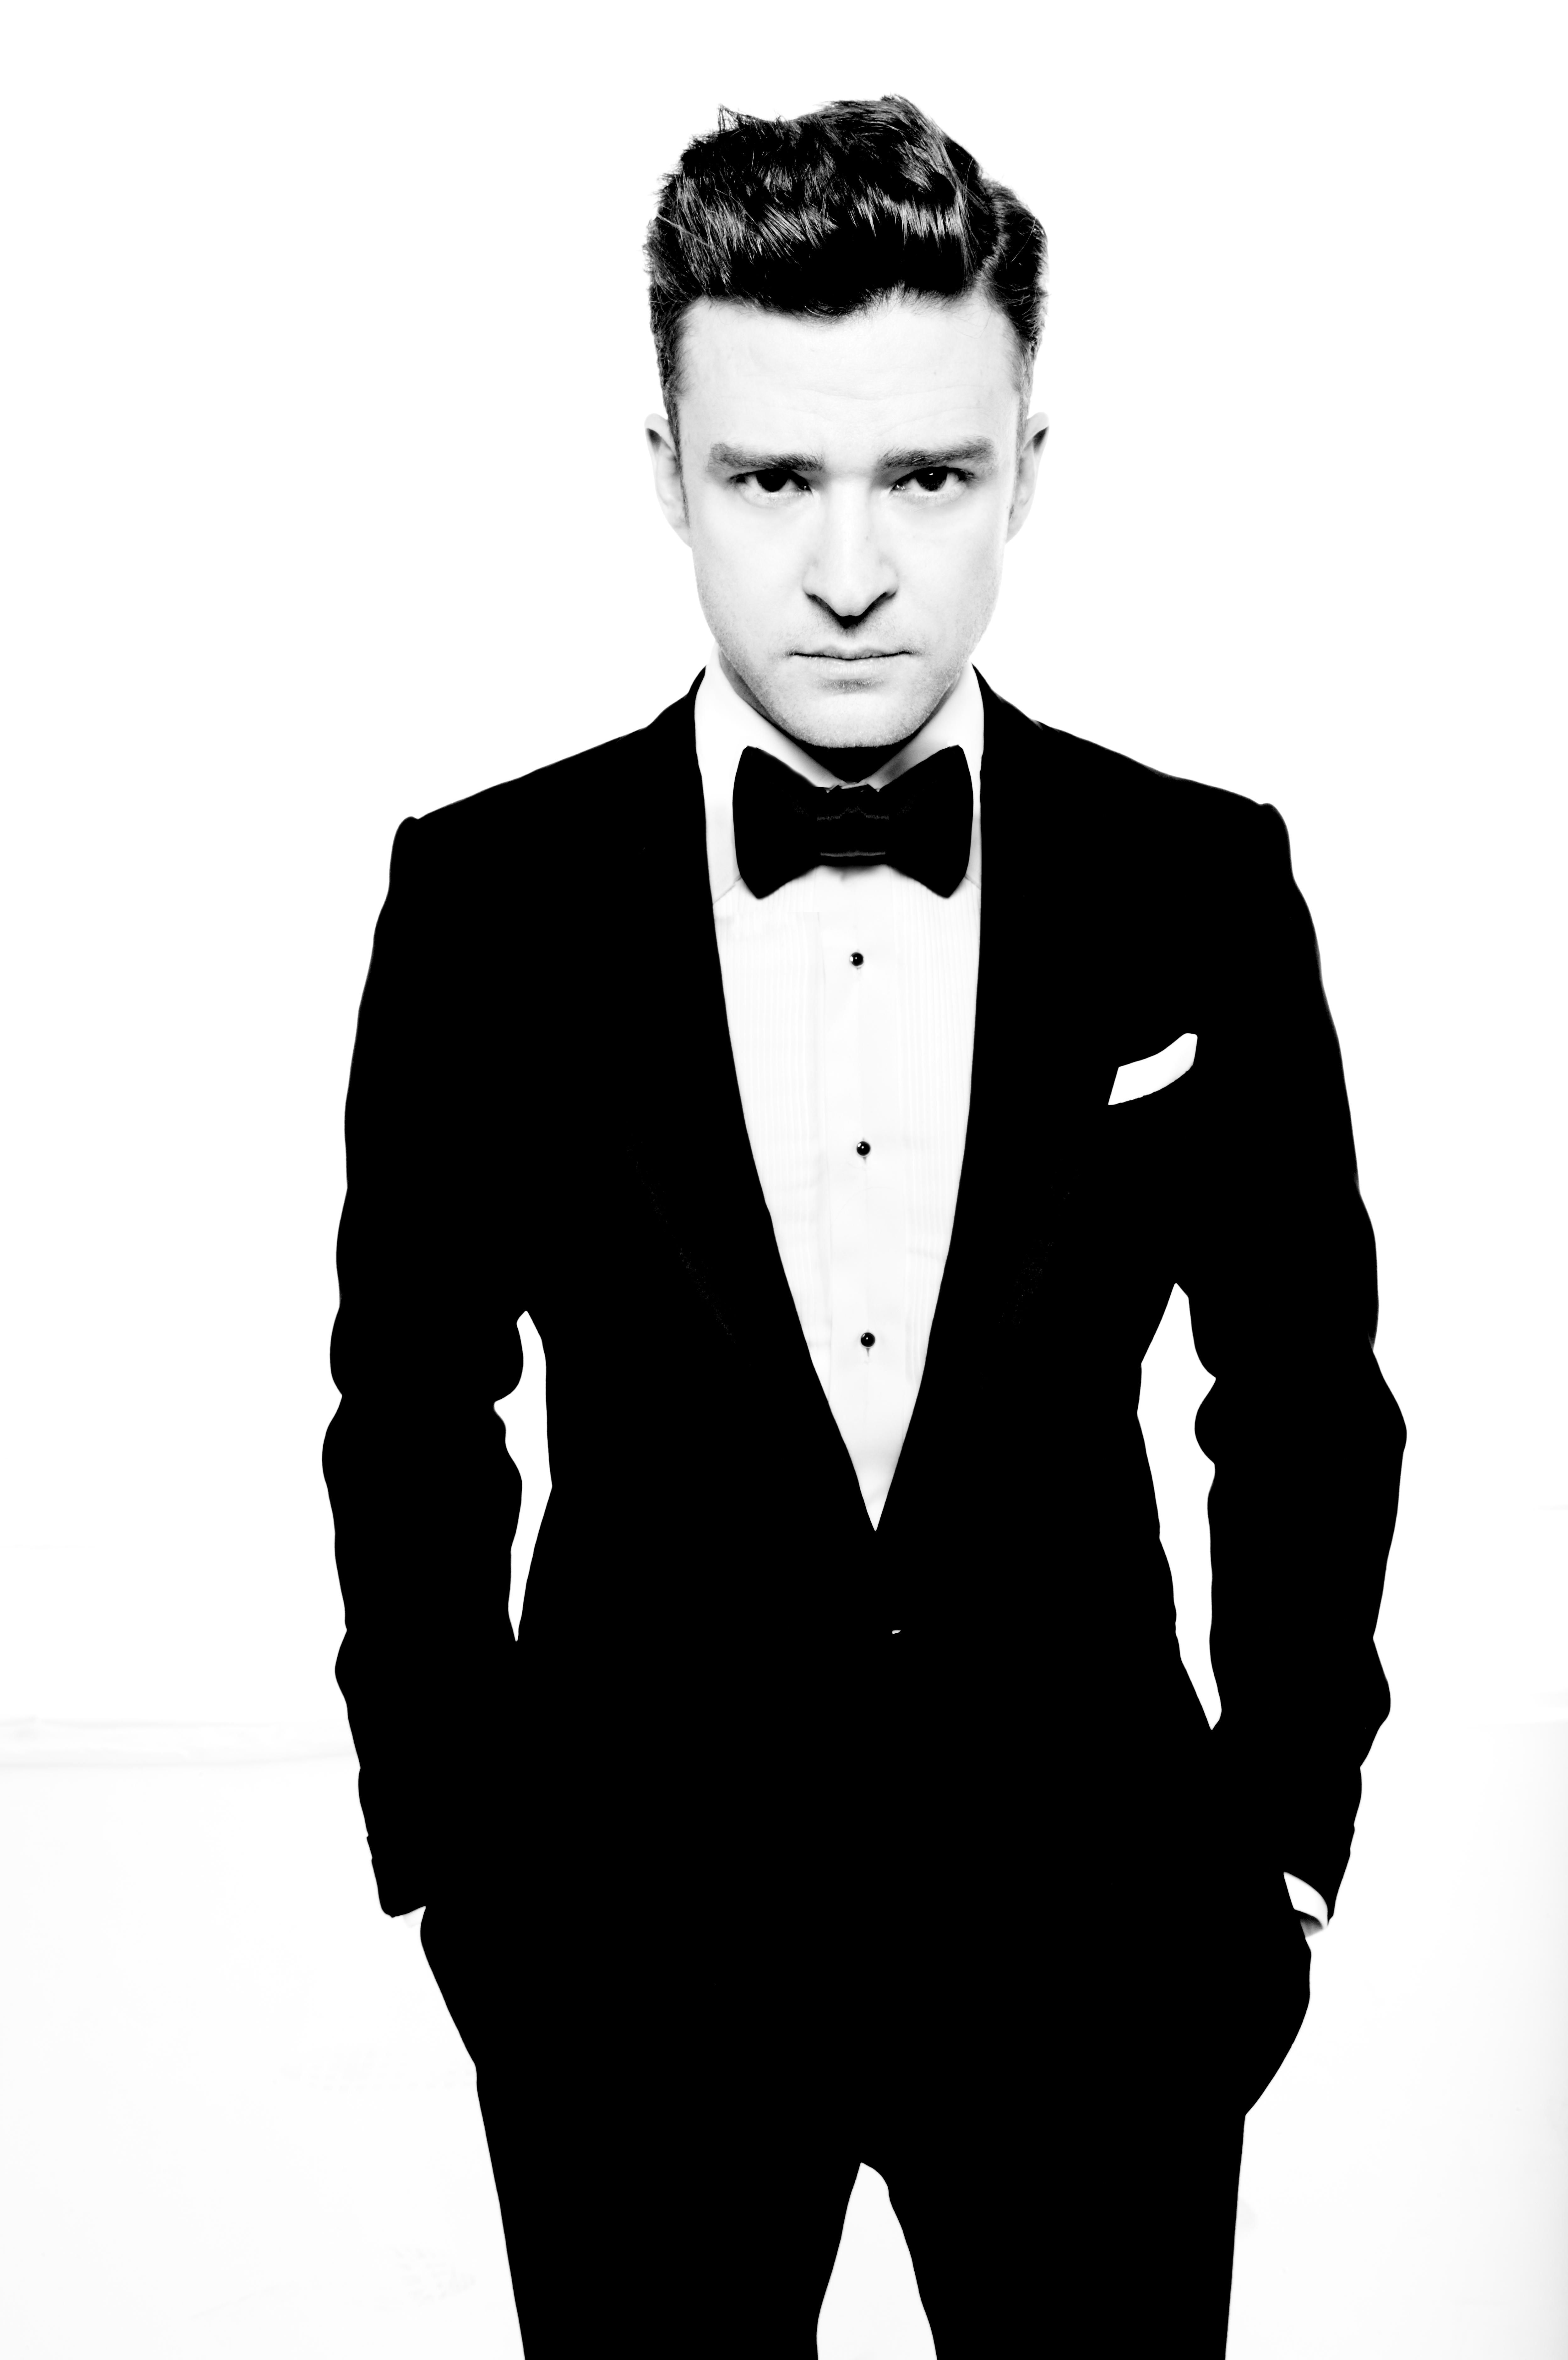 Justin Timberlake The 2020 Experience Tour 2014 Mlk Wwwmlkcom